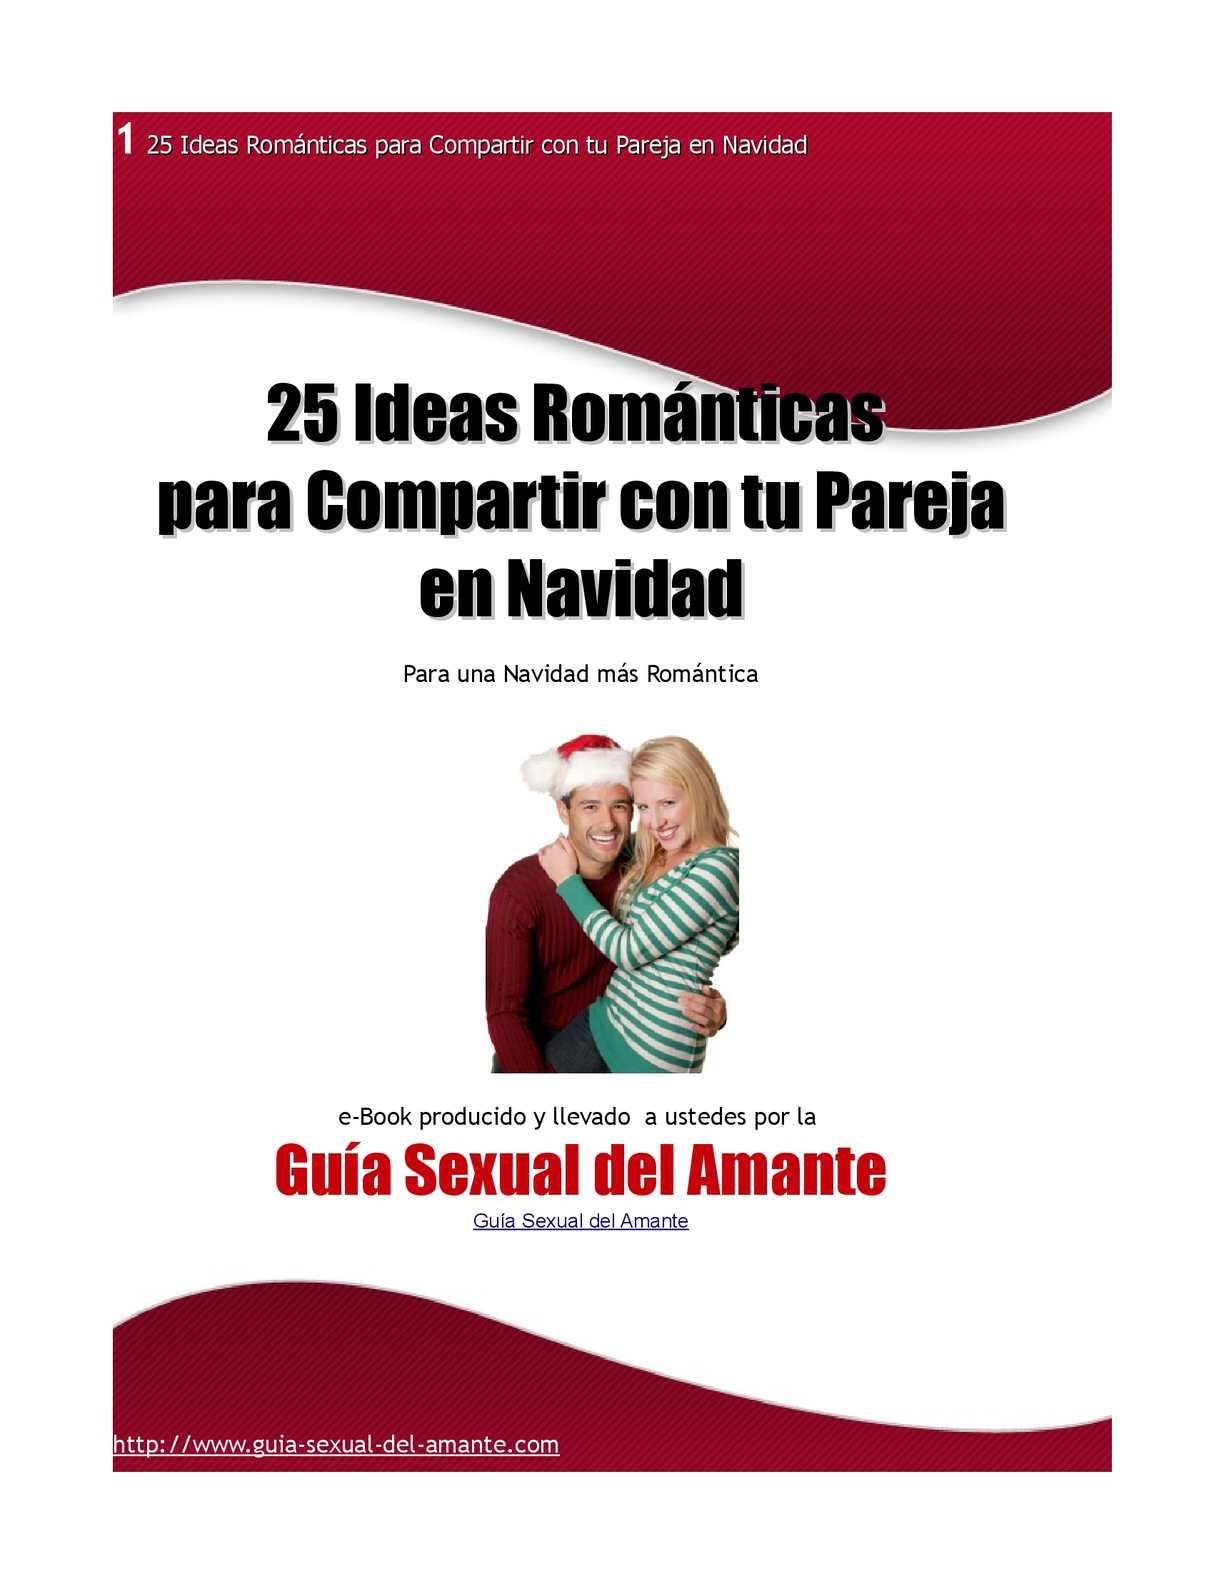 Calaméo - 25 Ideas Románticas para la Navidad 382a3fdb13b